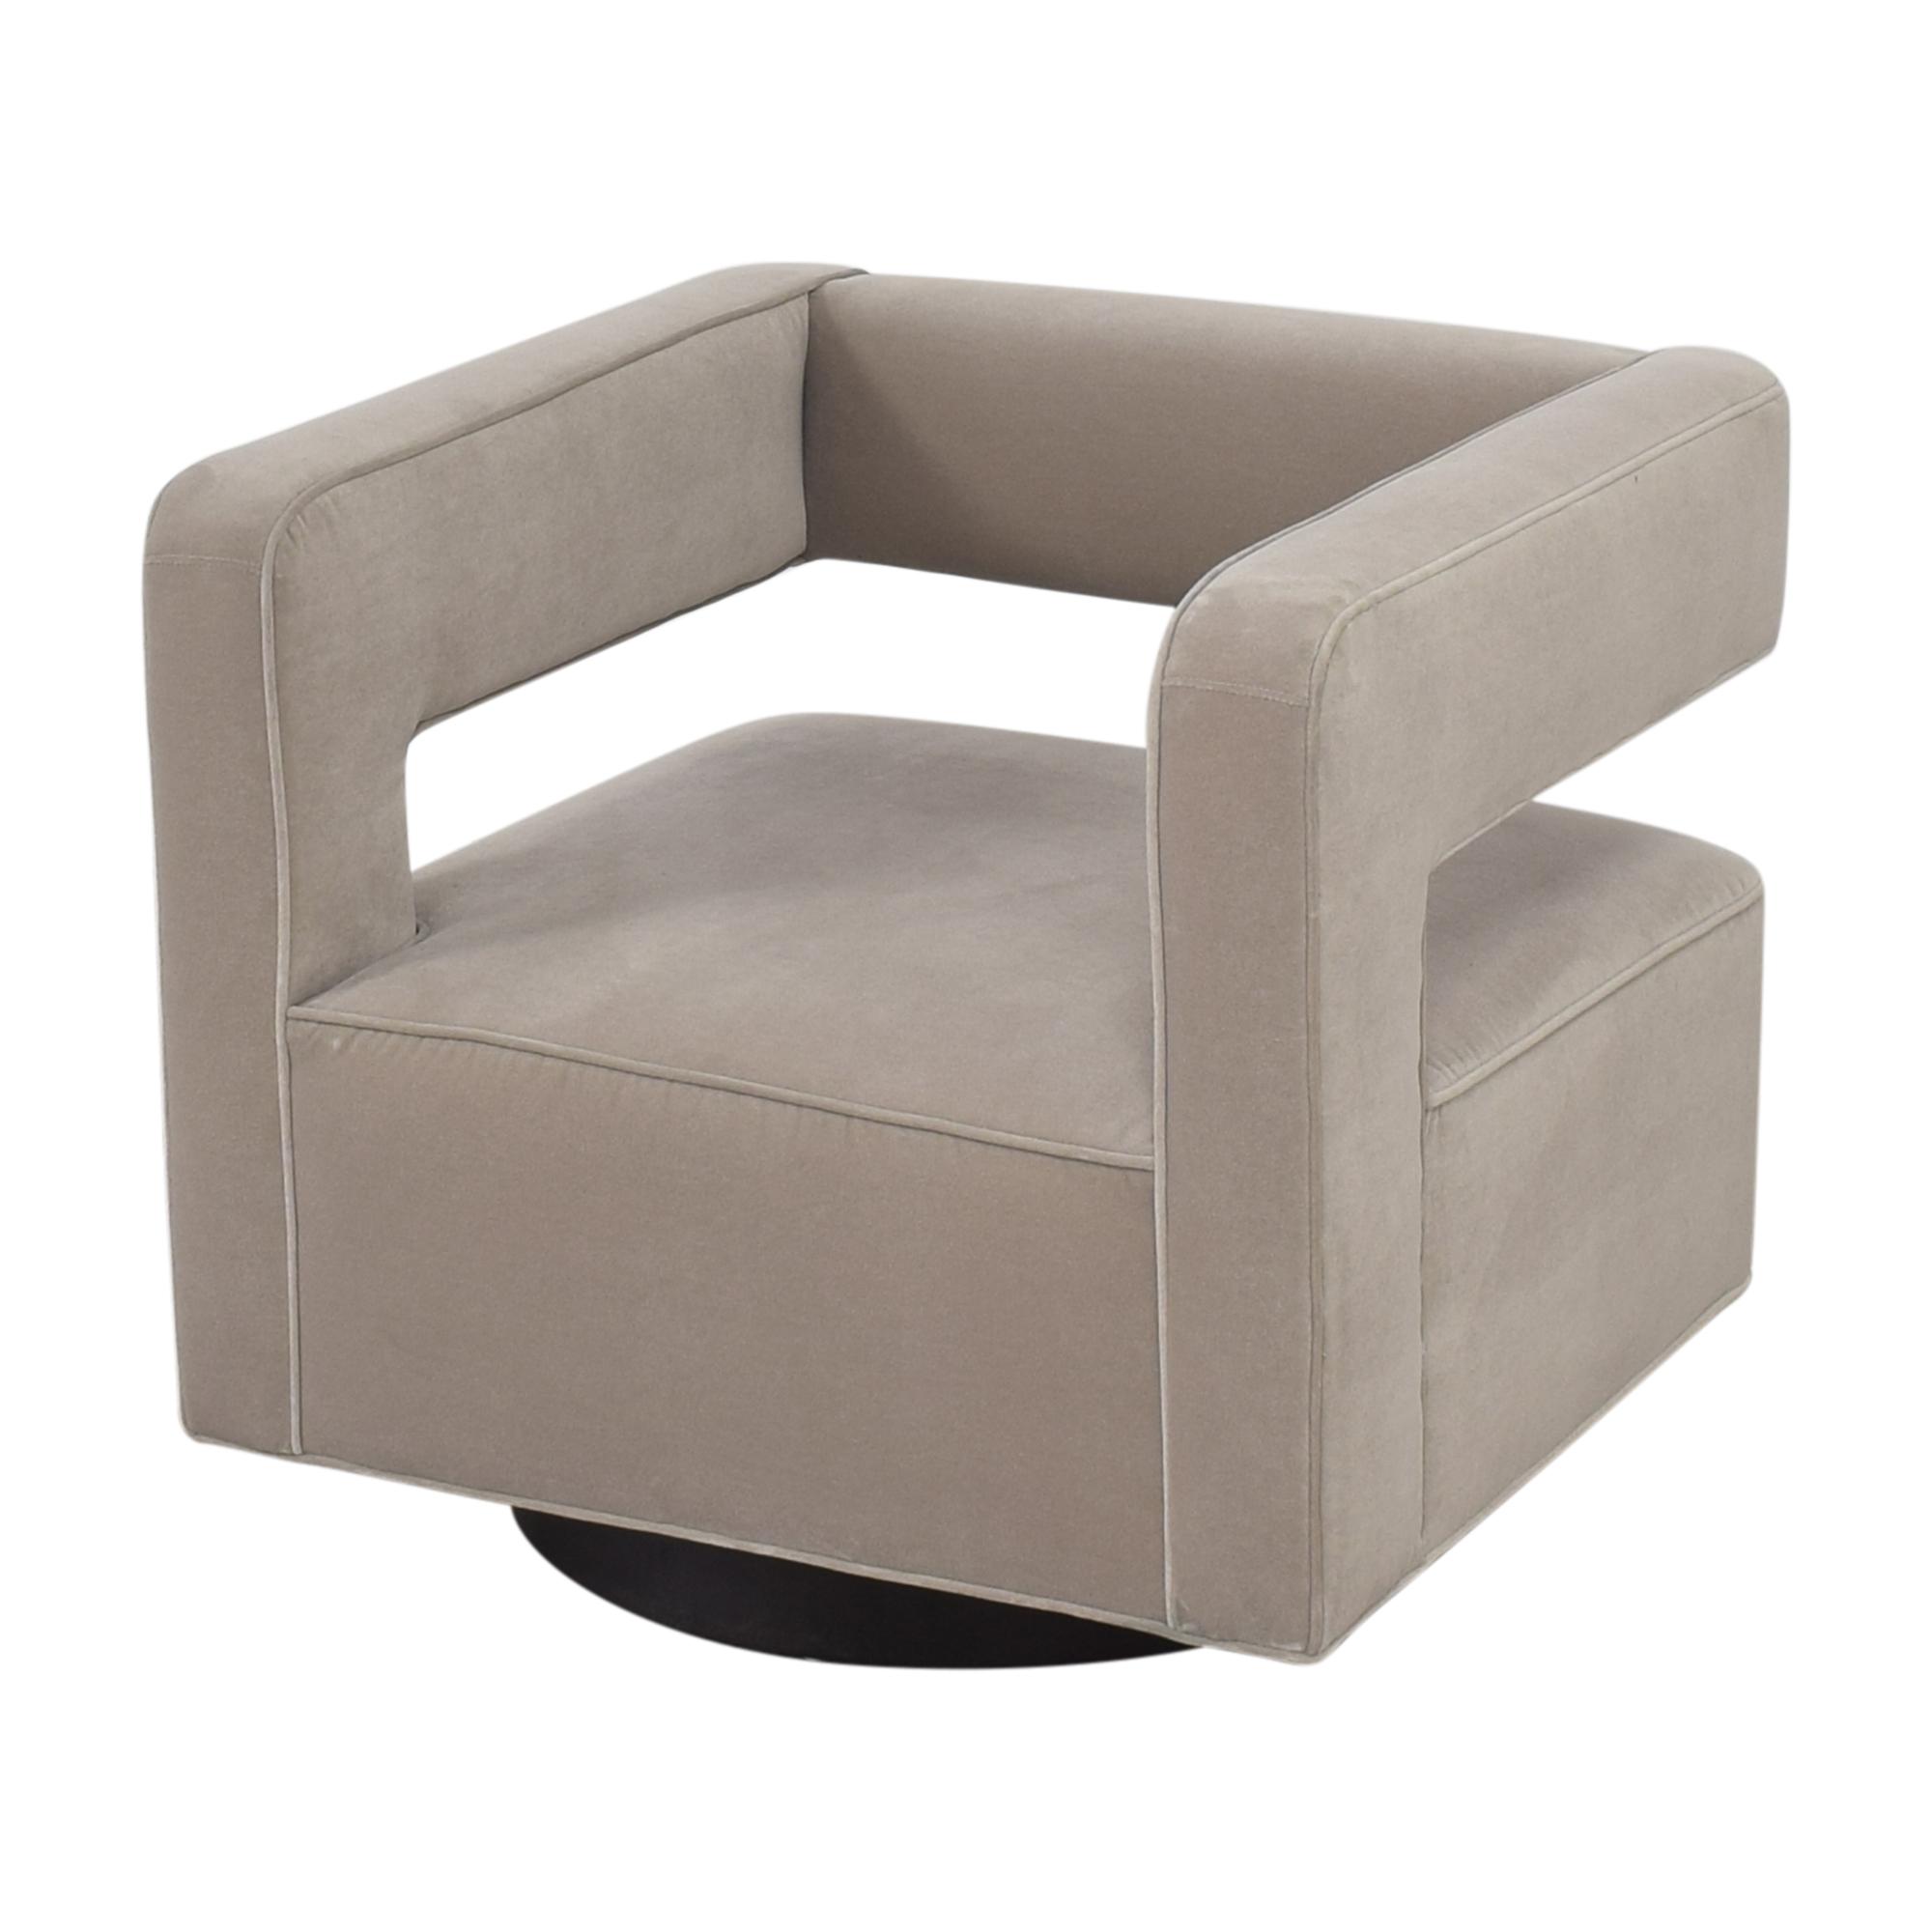 Mitchell Gold + Bob Williams Mitchell Gold + Bob Williams Nico Return Swivel Chair on sale